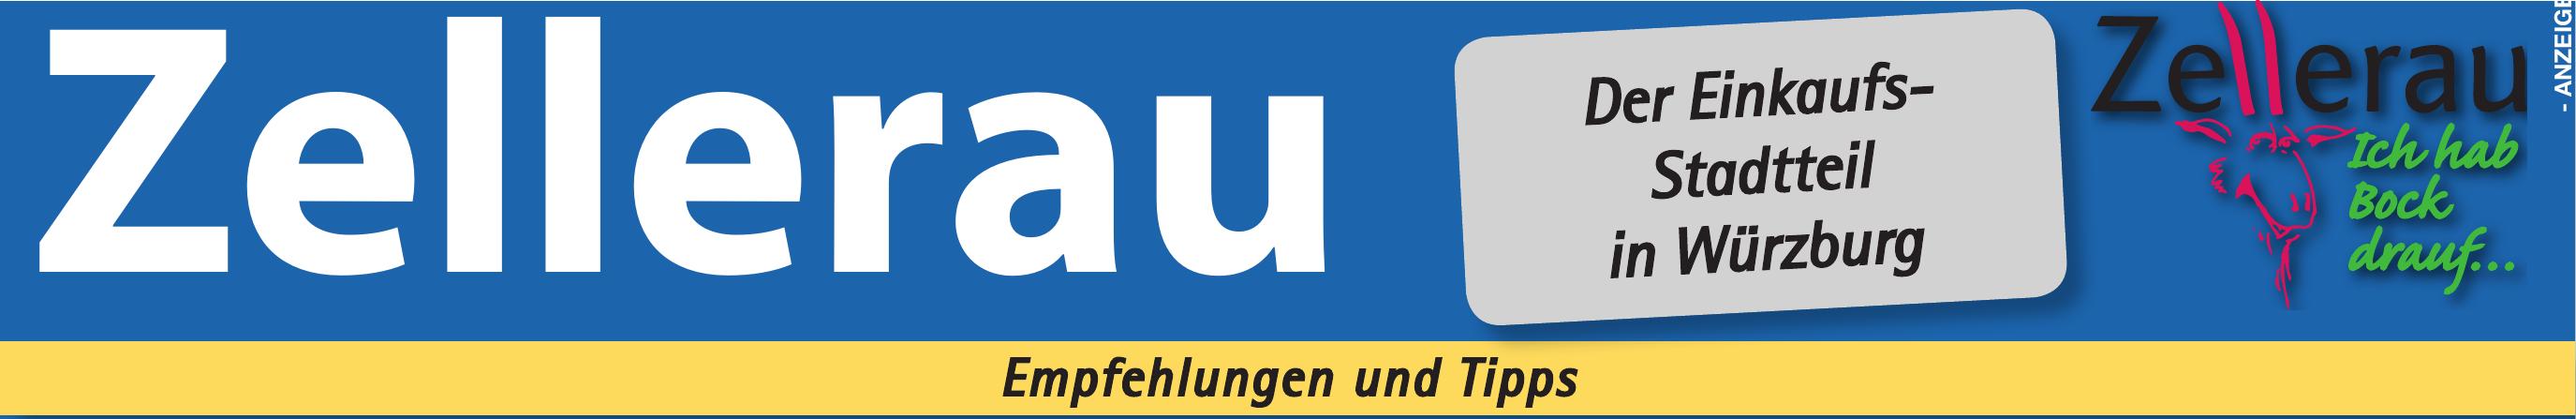 Veranstaltungshighlights des Bürgervereins Zellerau e.V. Image 1